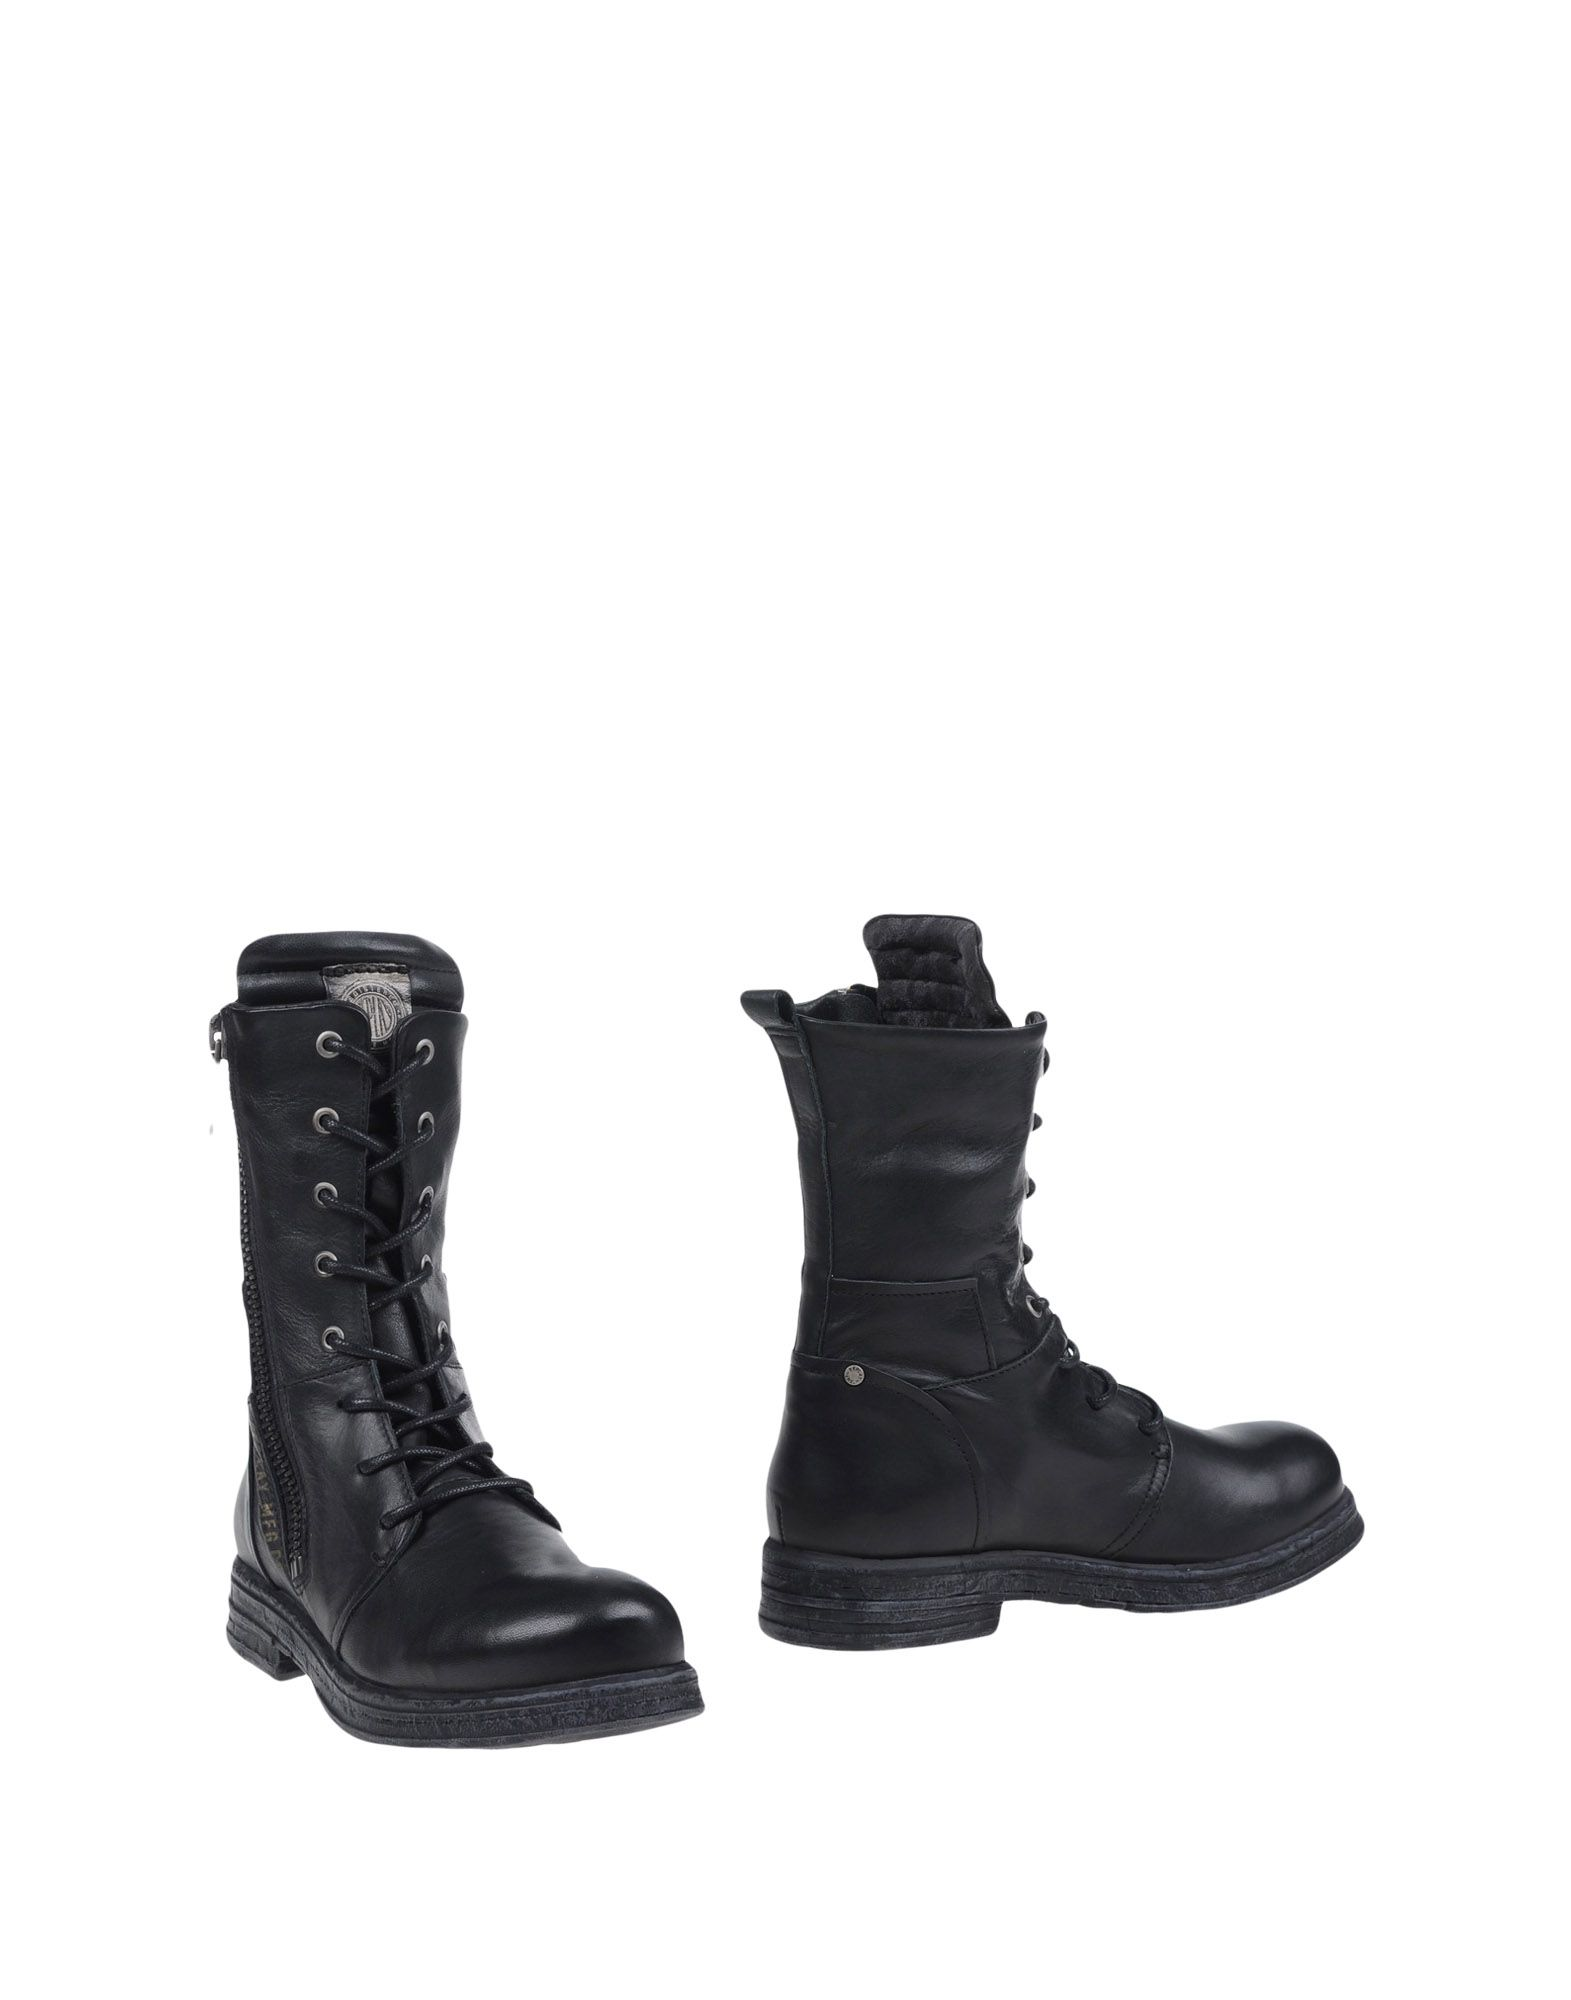 Replay Stiefelette Damen  11027990KN Gute Qualität beliebte Schuhe